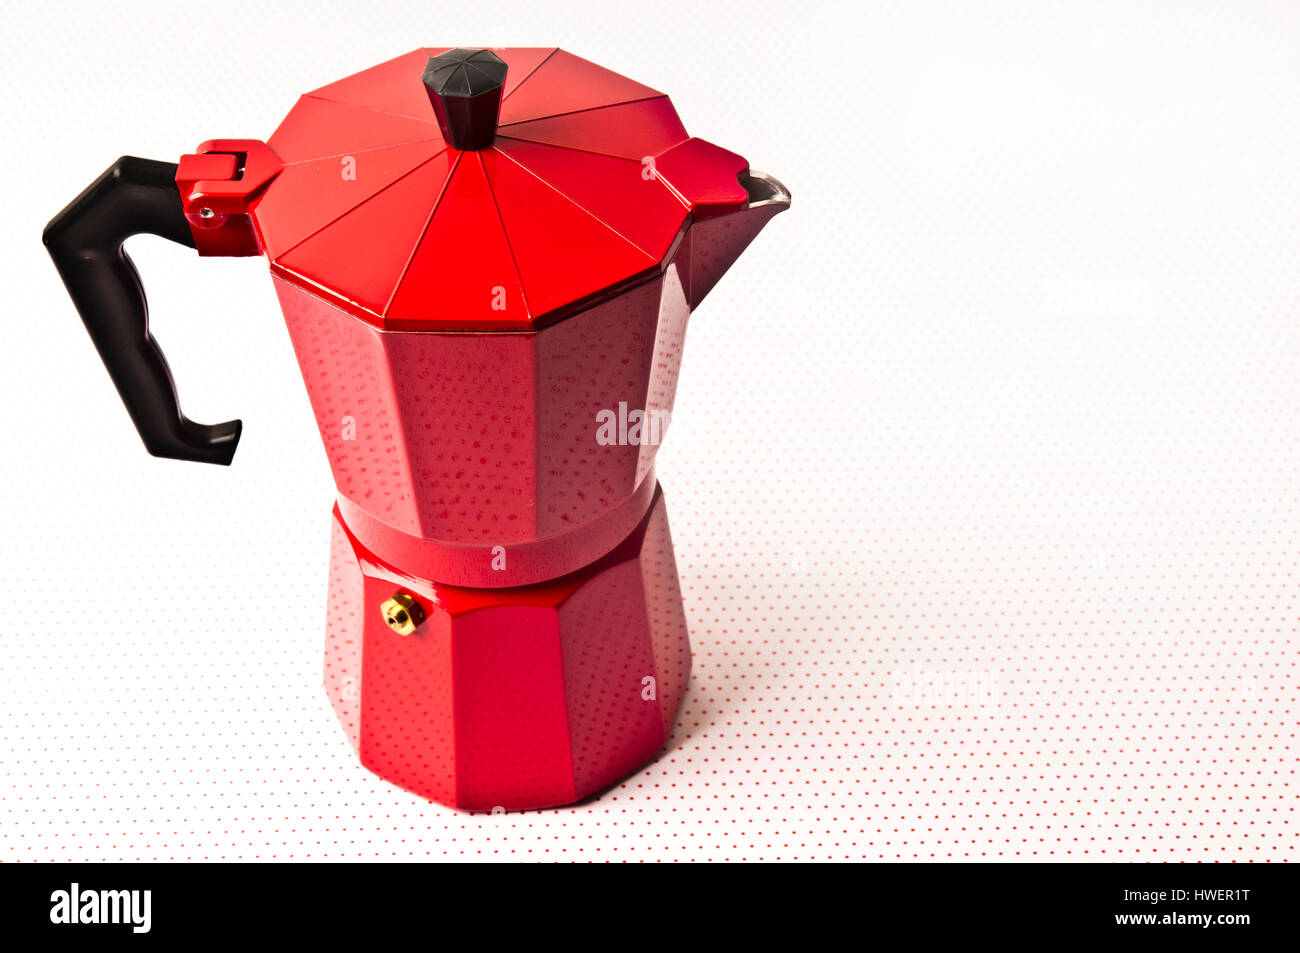 red coffee maker moka - Stock Image